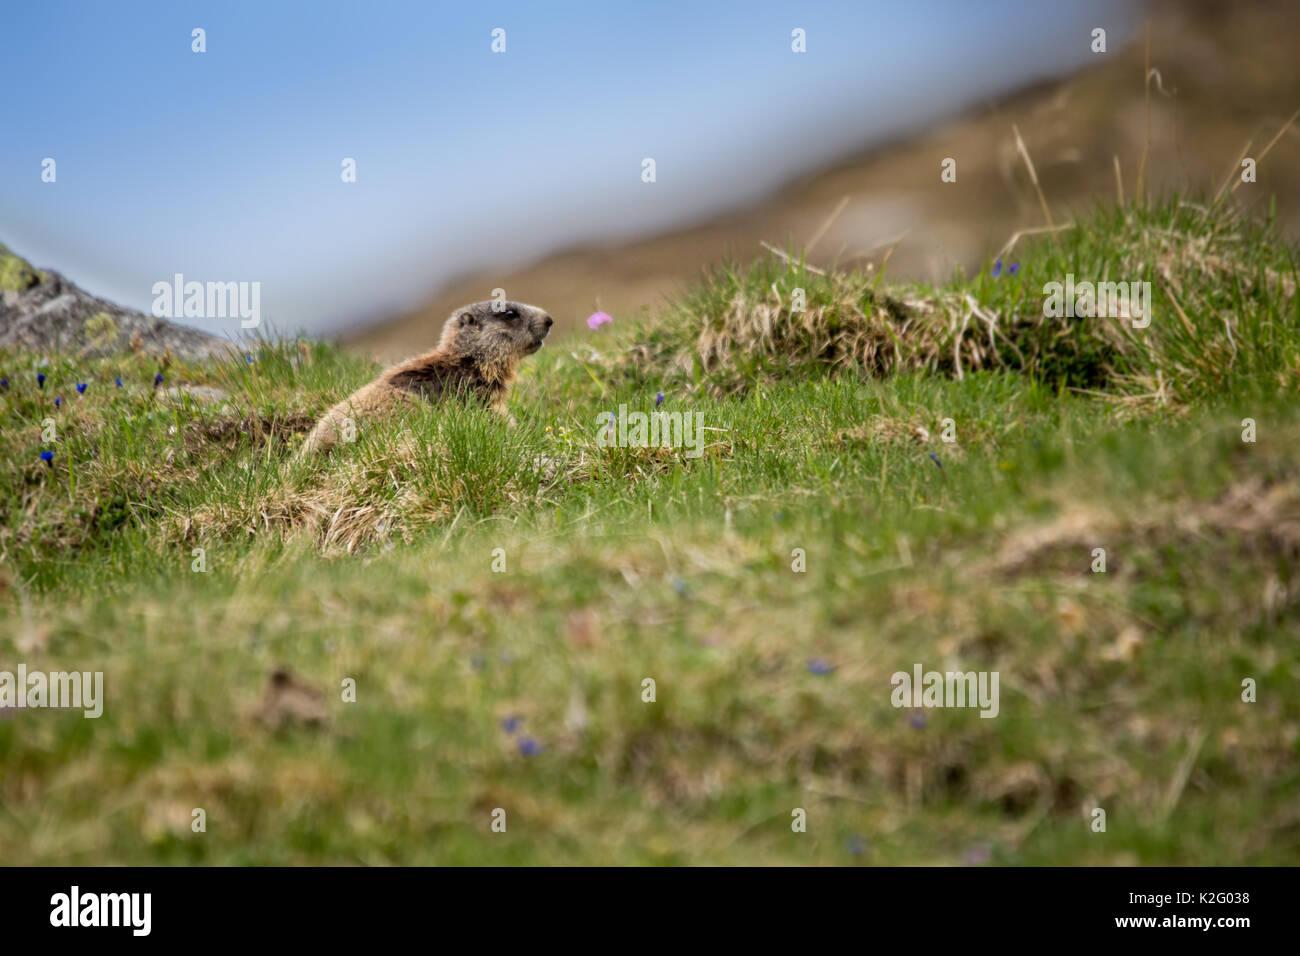 Baby Marmot Sitting on Meadow, European Alps, Italy - Stock Image